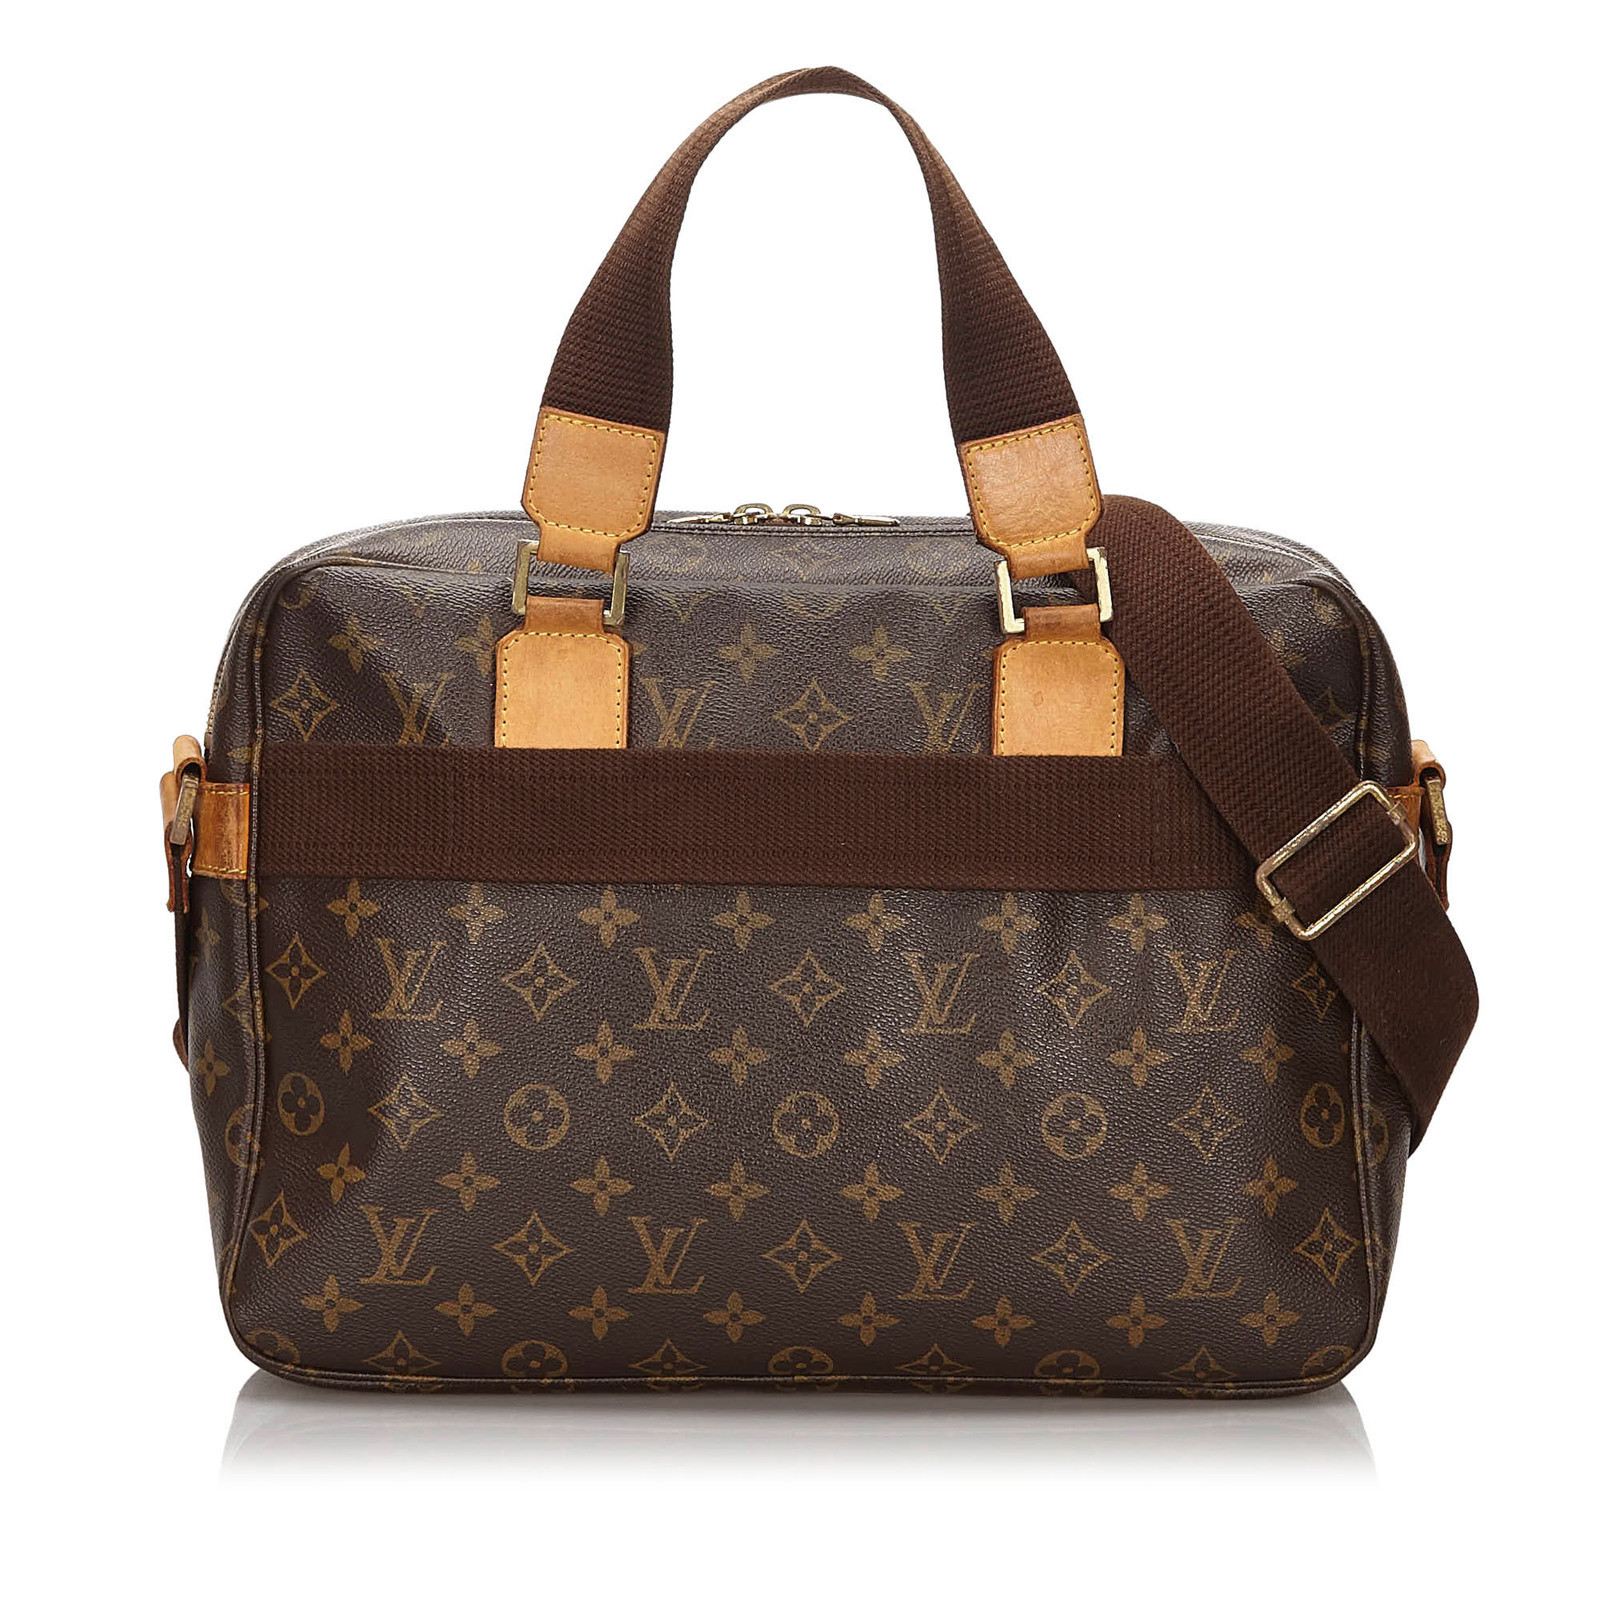 Louis Vuitton Handbag Canvas In Brown